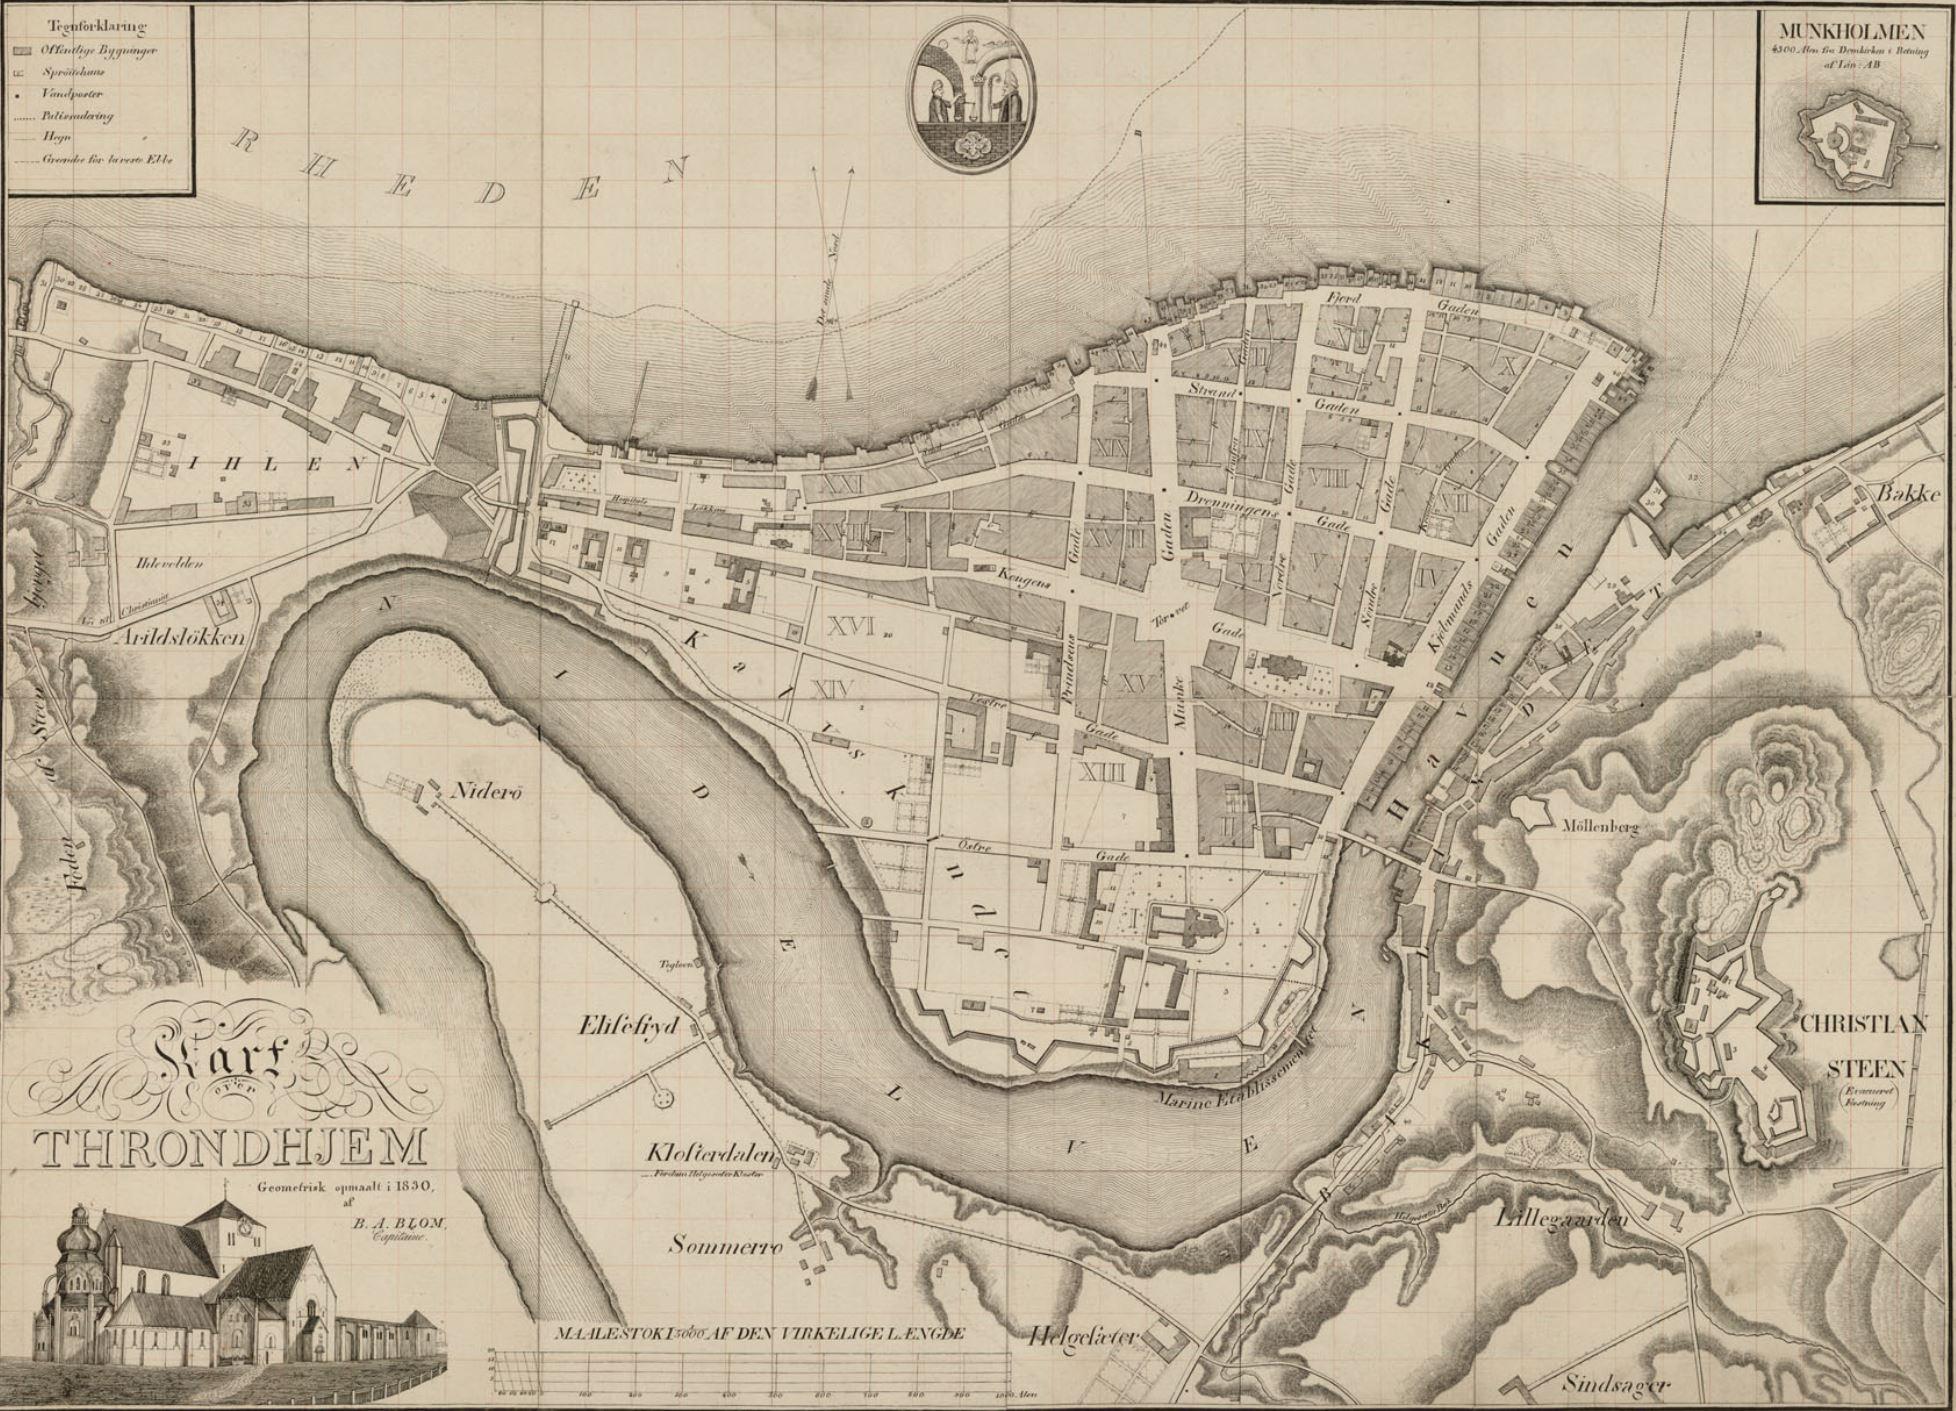 Trondhjemskart I Nytrykk 1695 1909 Trondhjems Historiske Forening